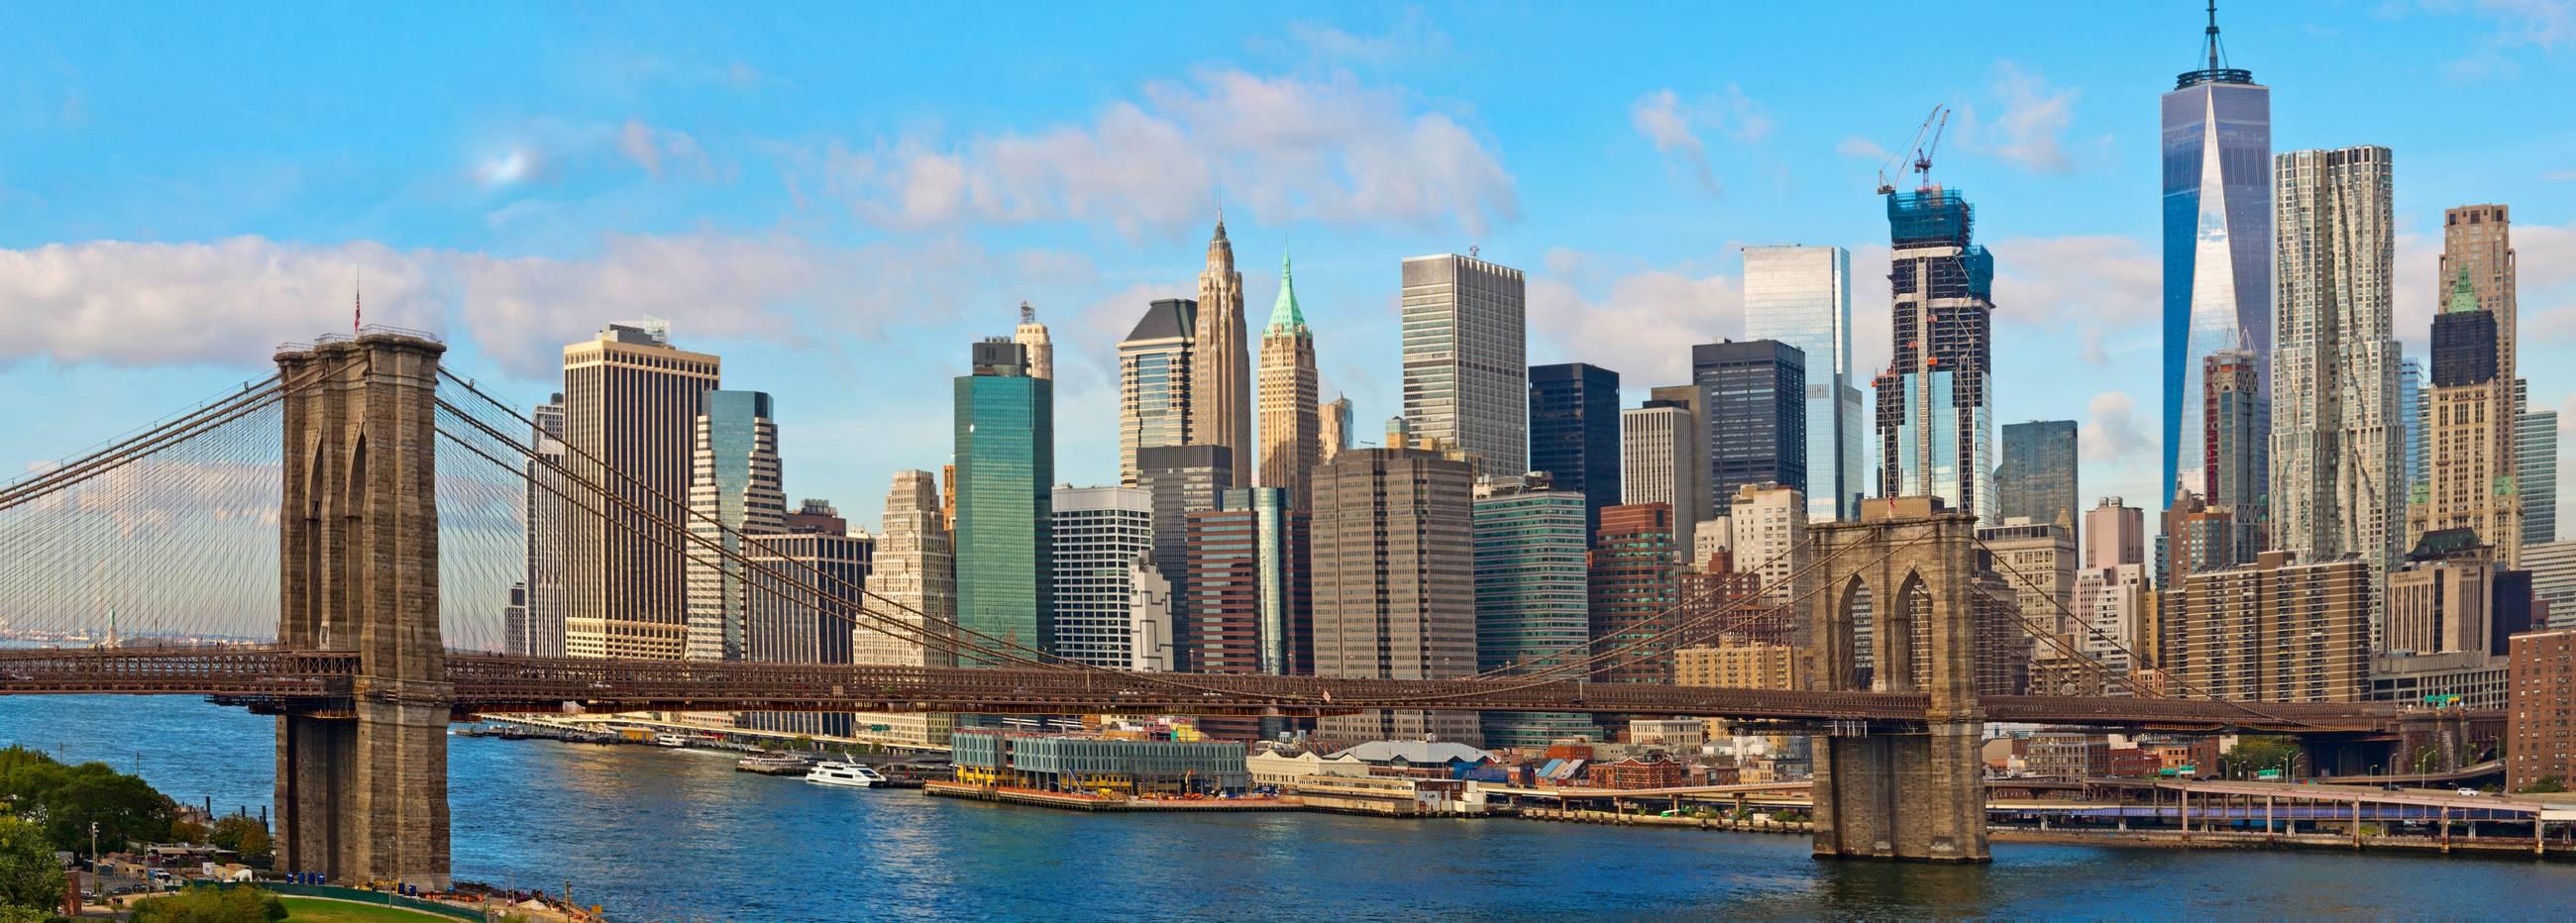 new-york-freebies-brooklyn-bridge